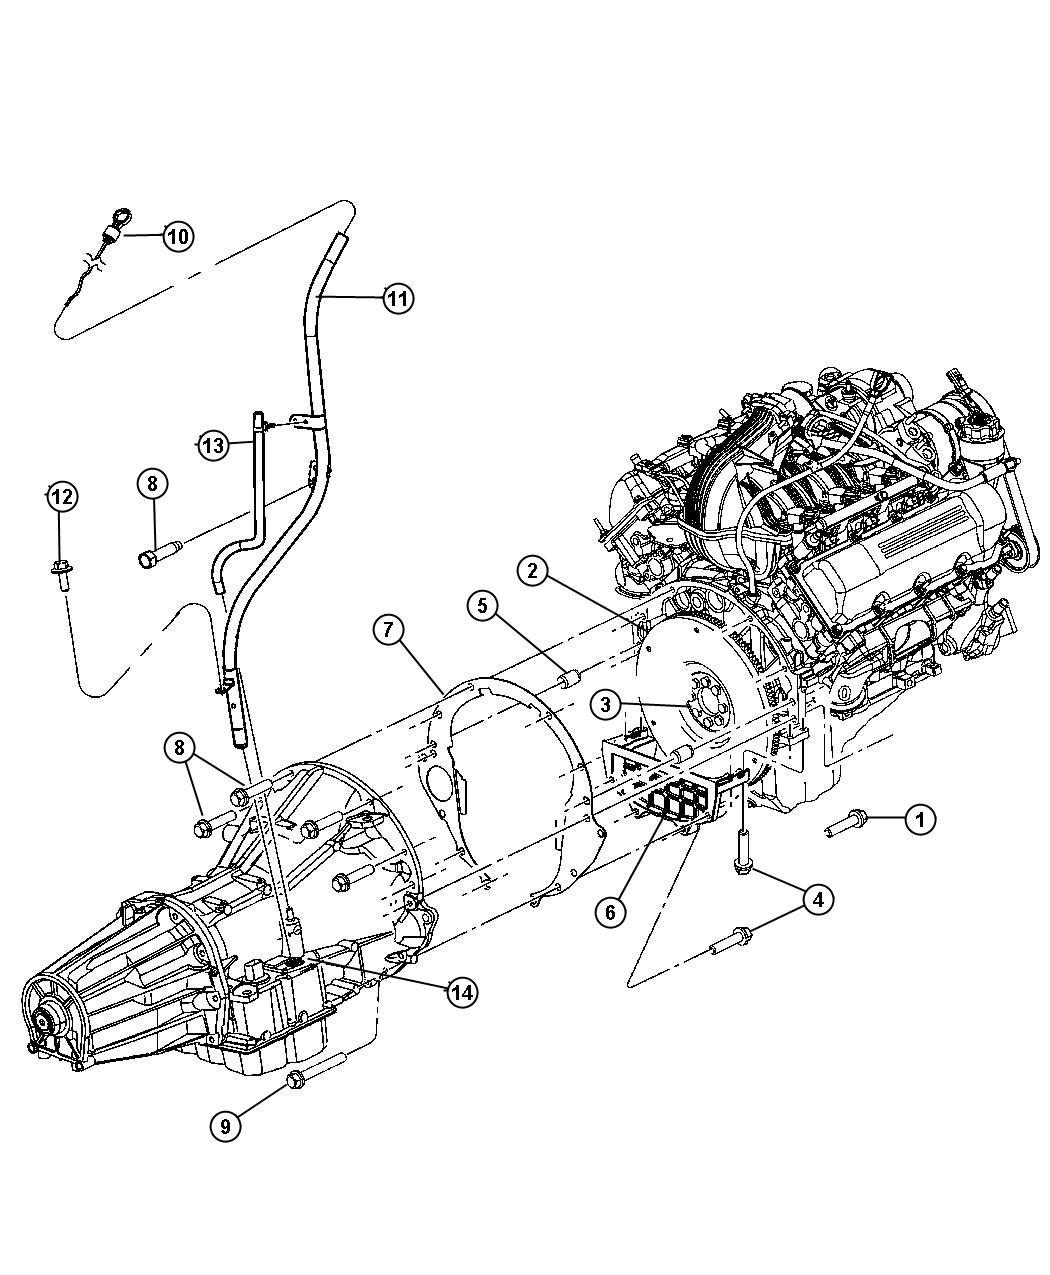 Chrysler 300 Indicator Transmission Fluid Level Related